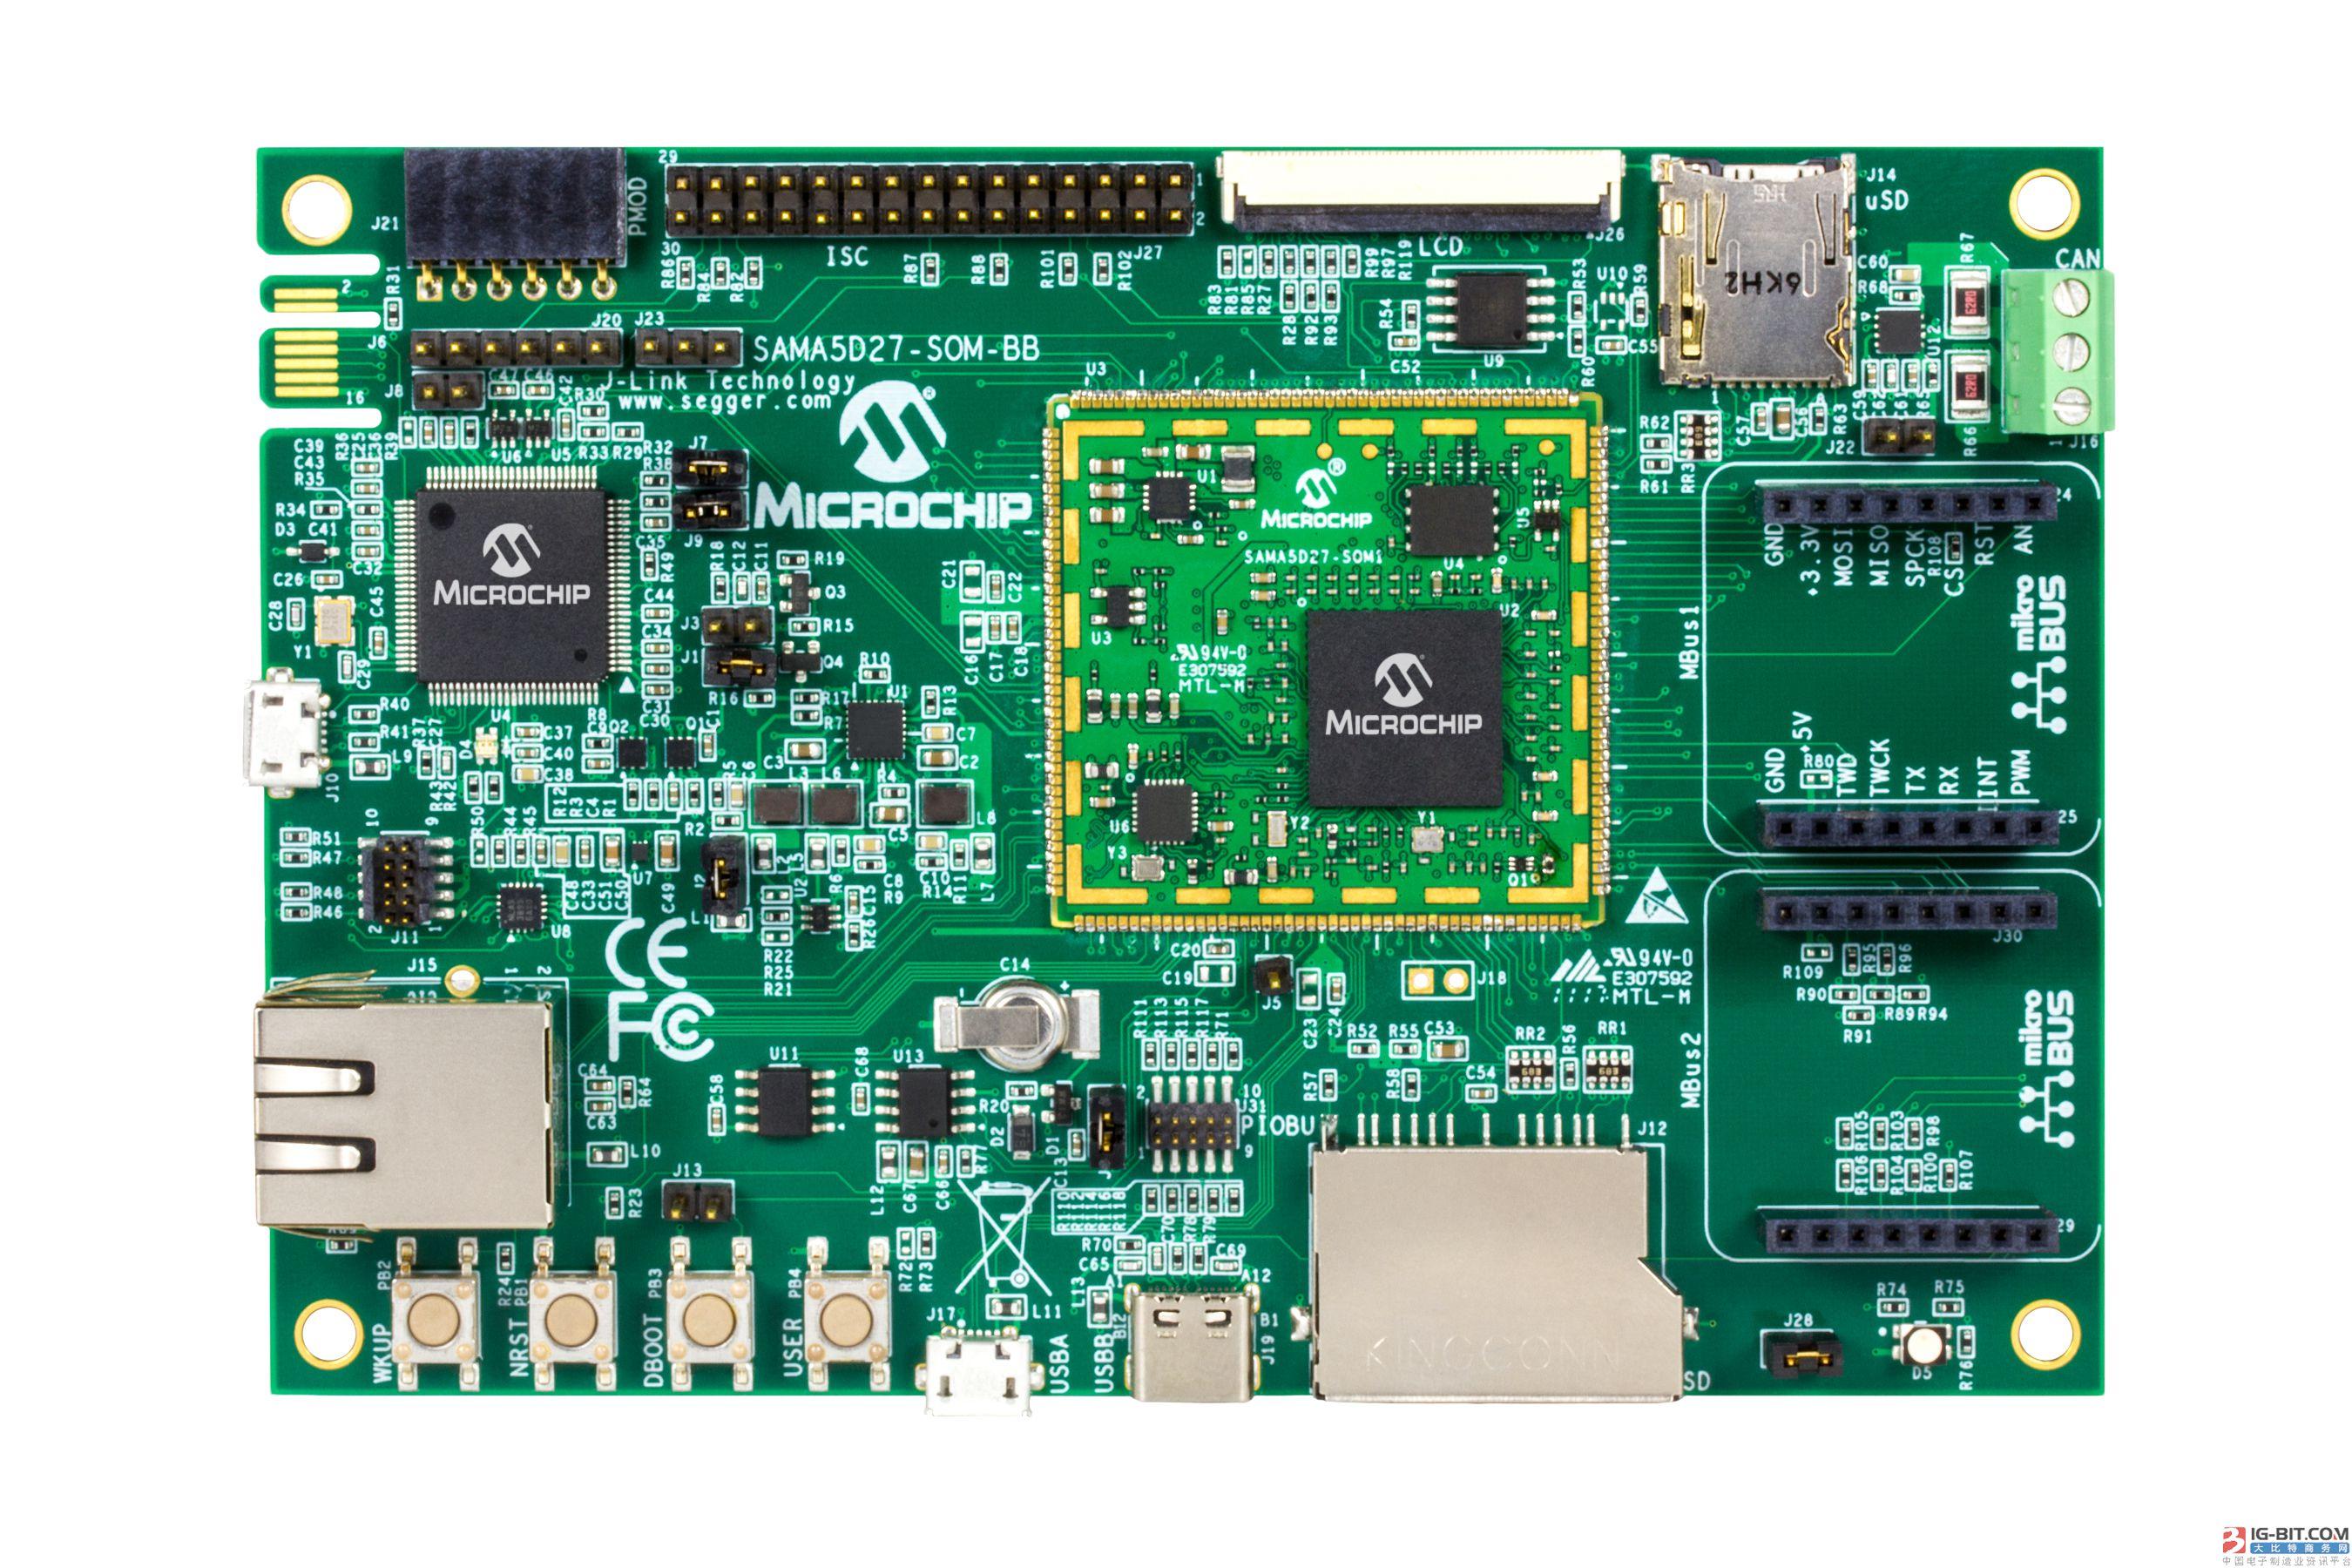 Microchip通过基于SAMA5D2 MPU的系统模块简化工业级Linux®的设计